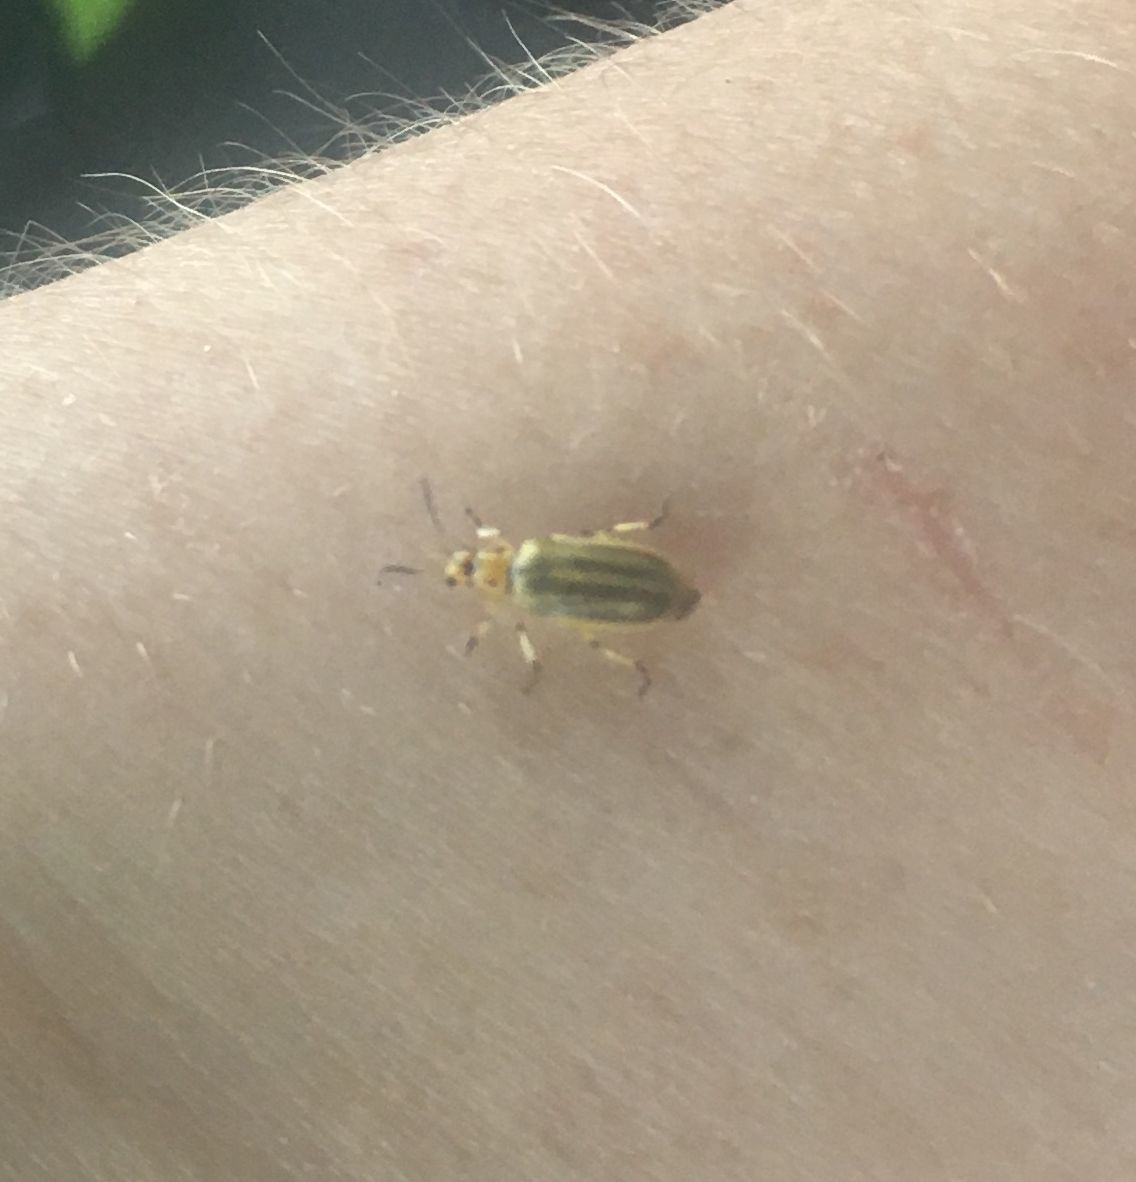 200708-news-beetle1.JPG